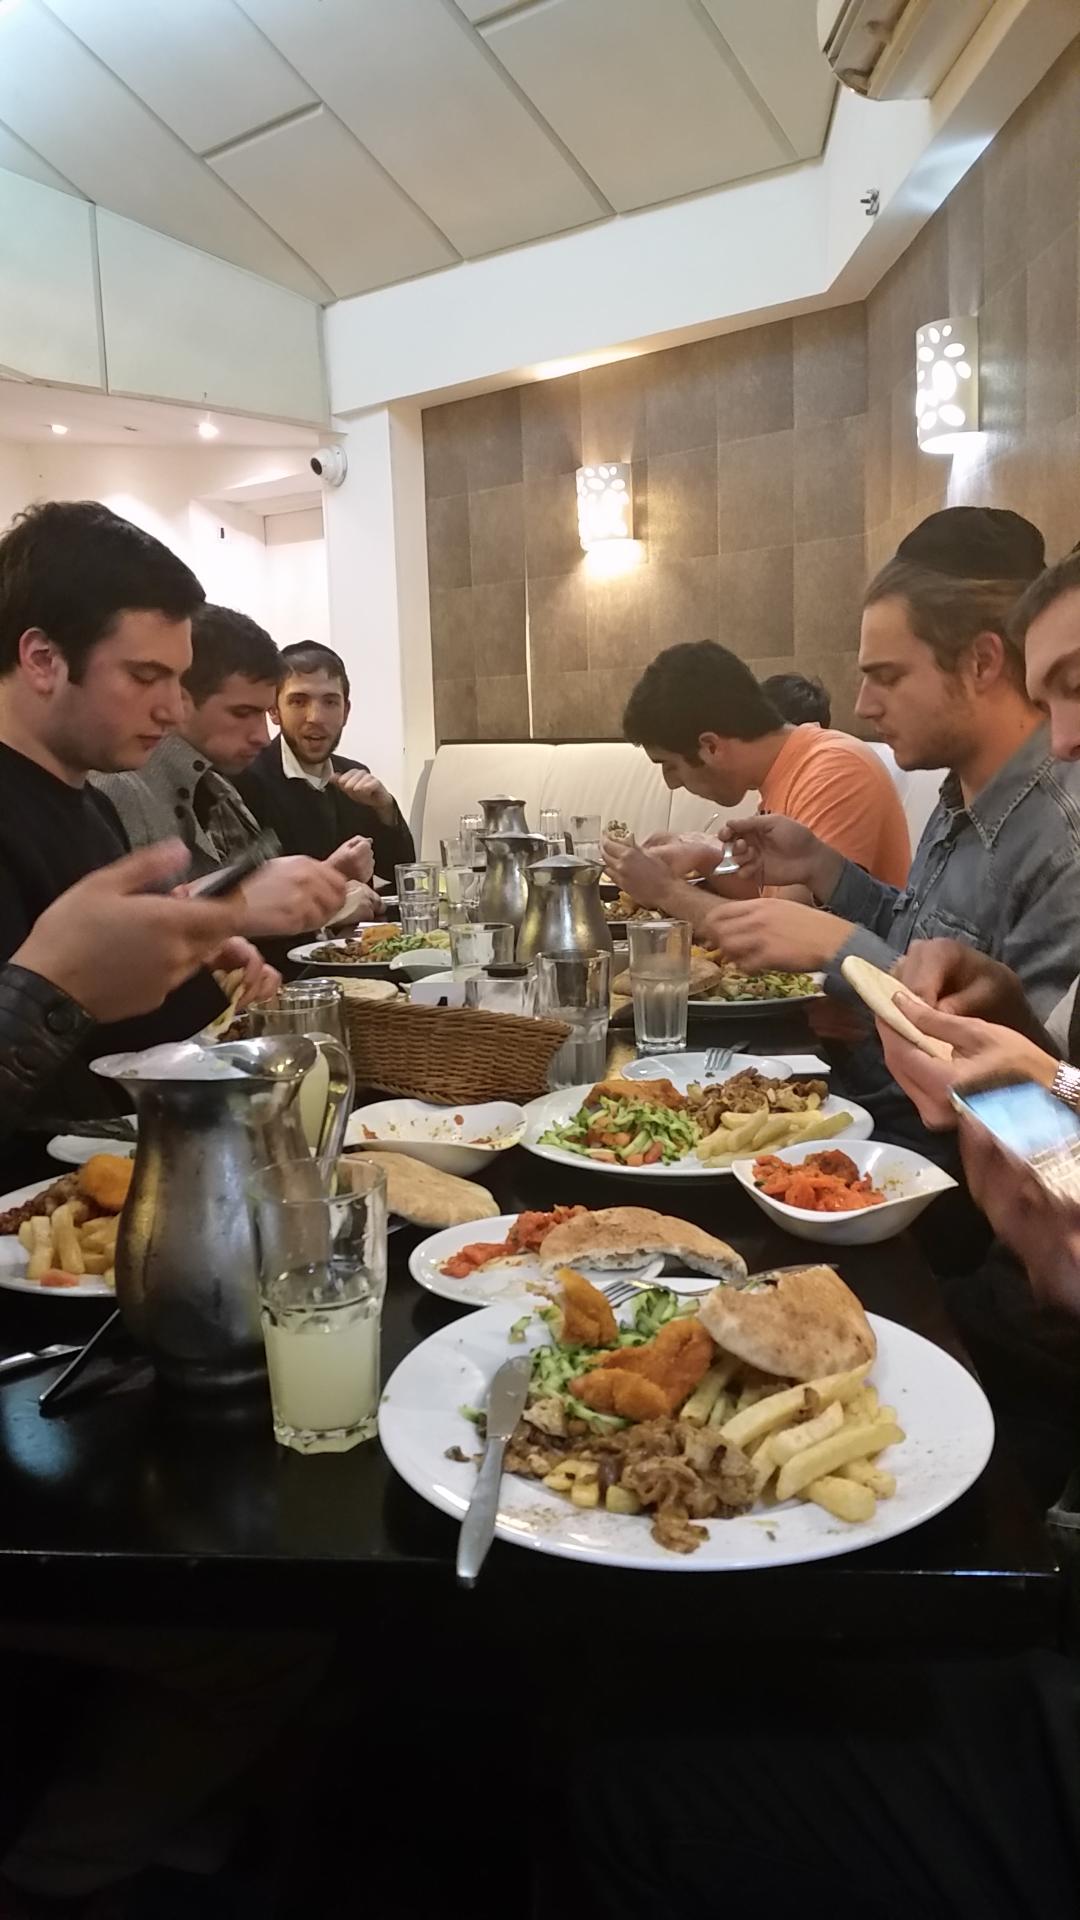 Dinner & Texting